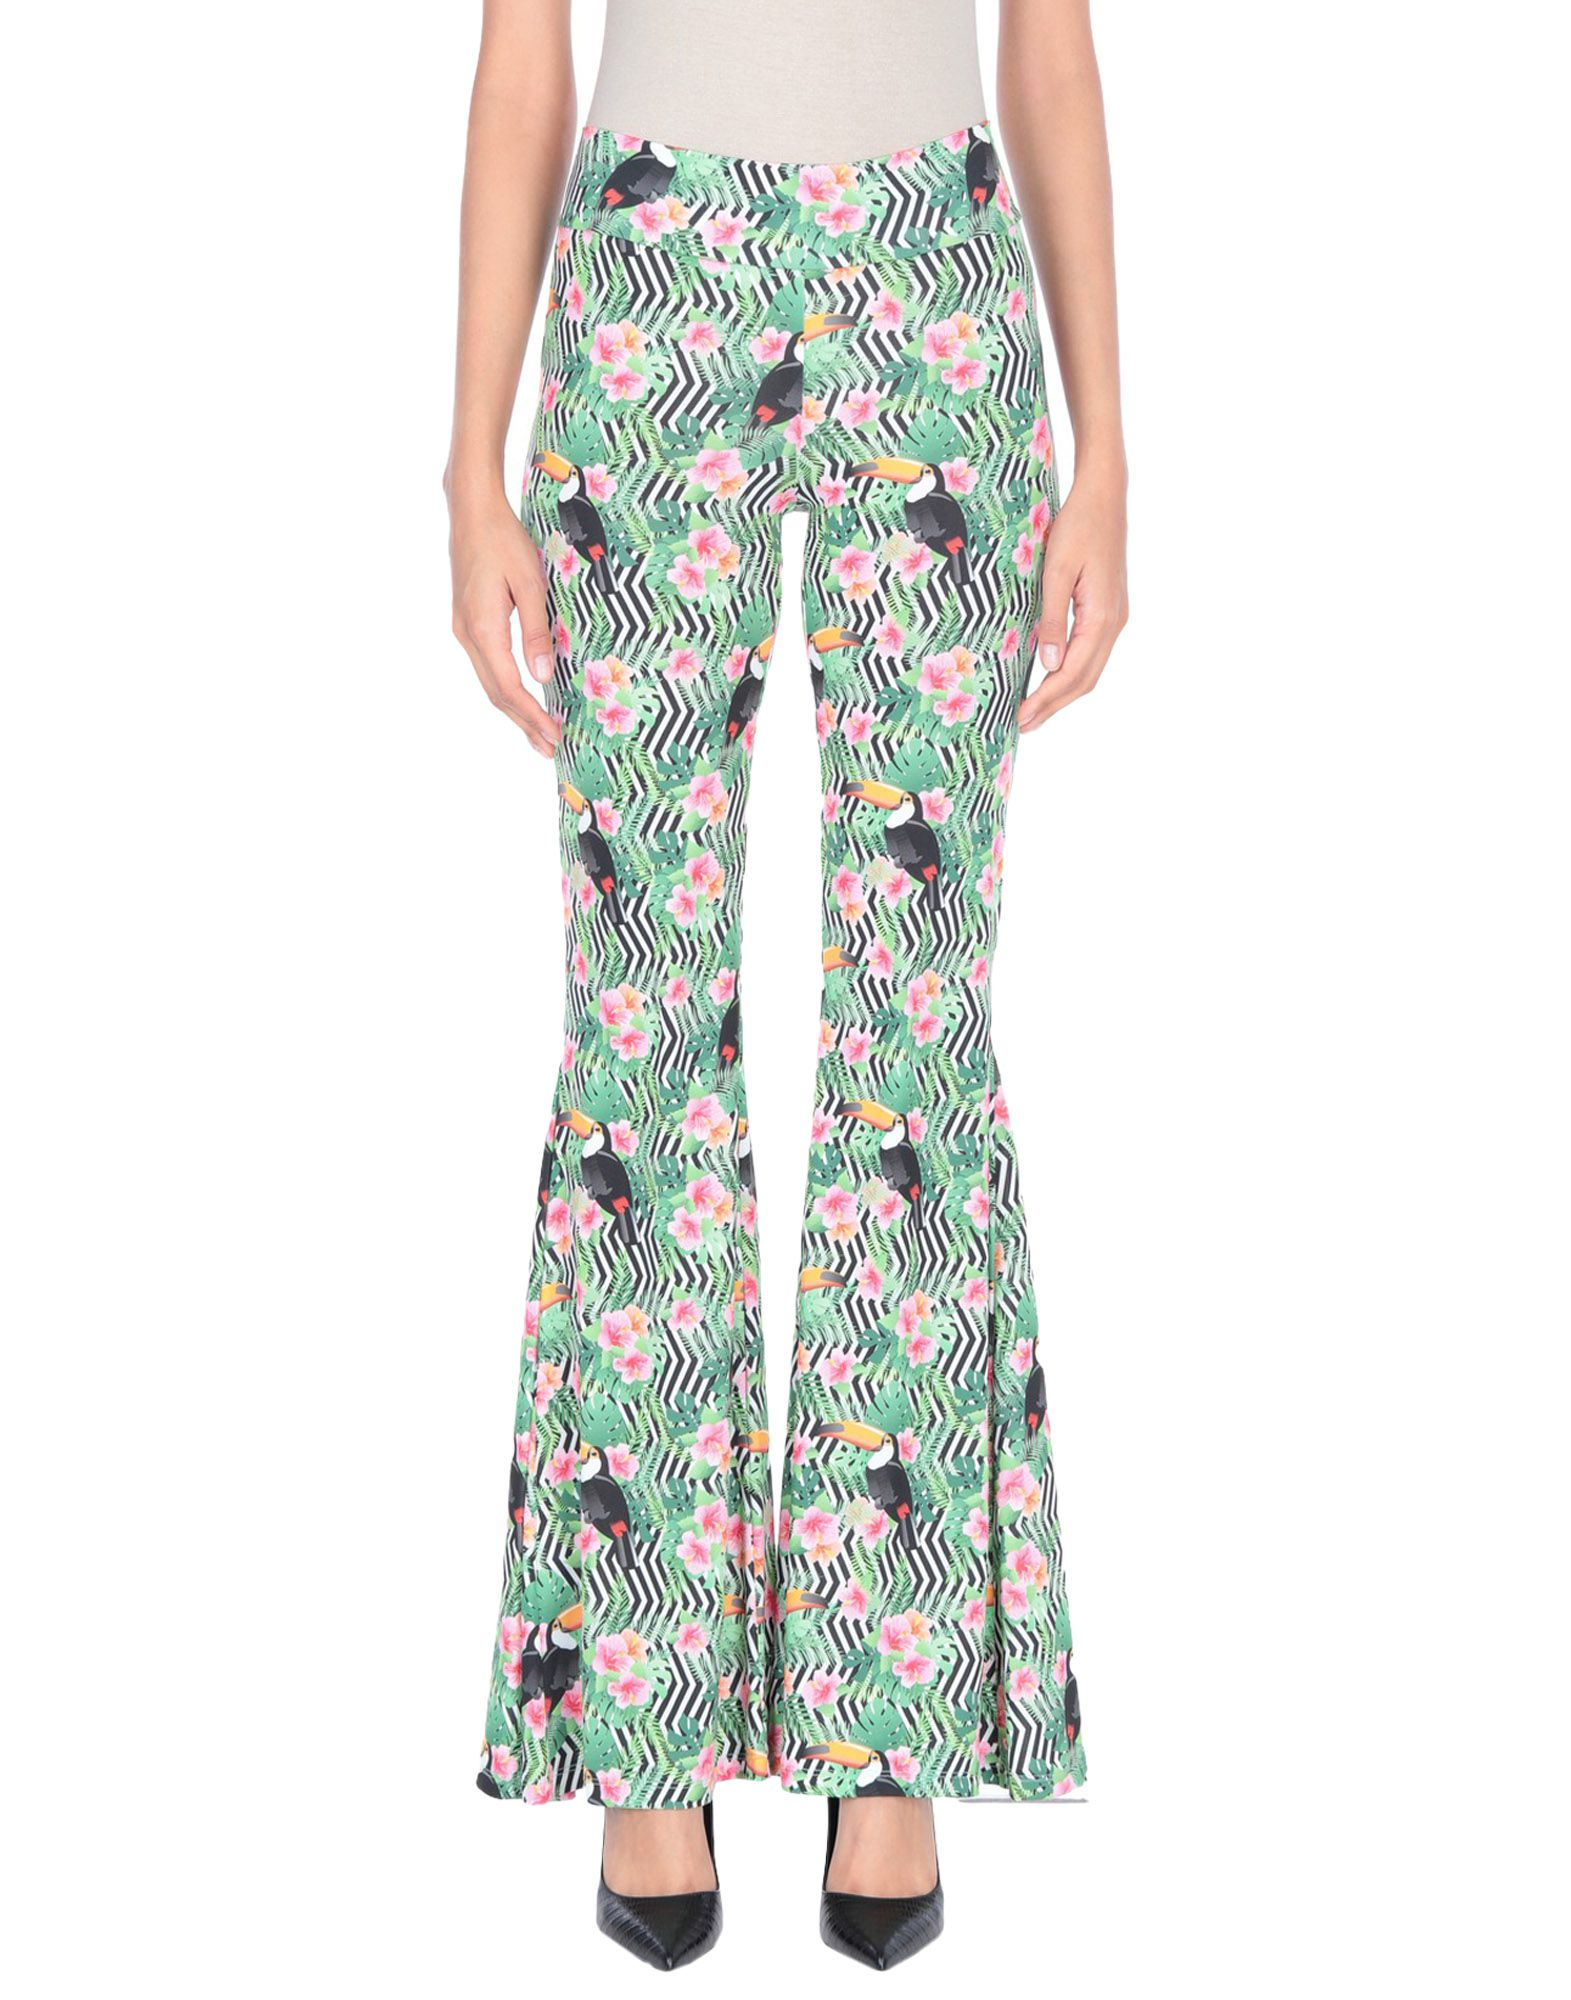 Pantalone Pantalone Nash Milano donna - 13255464HH  erstklassiger Service